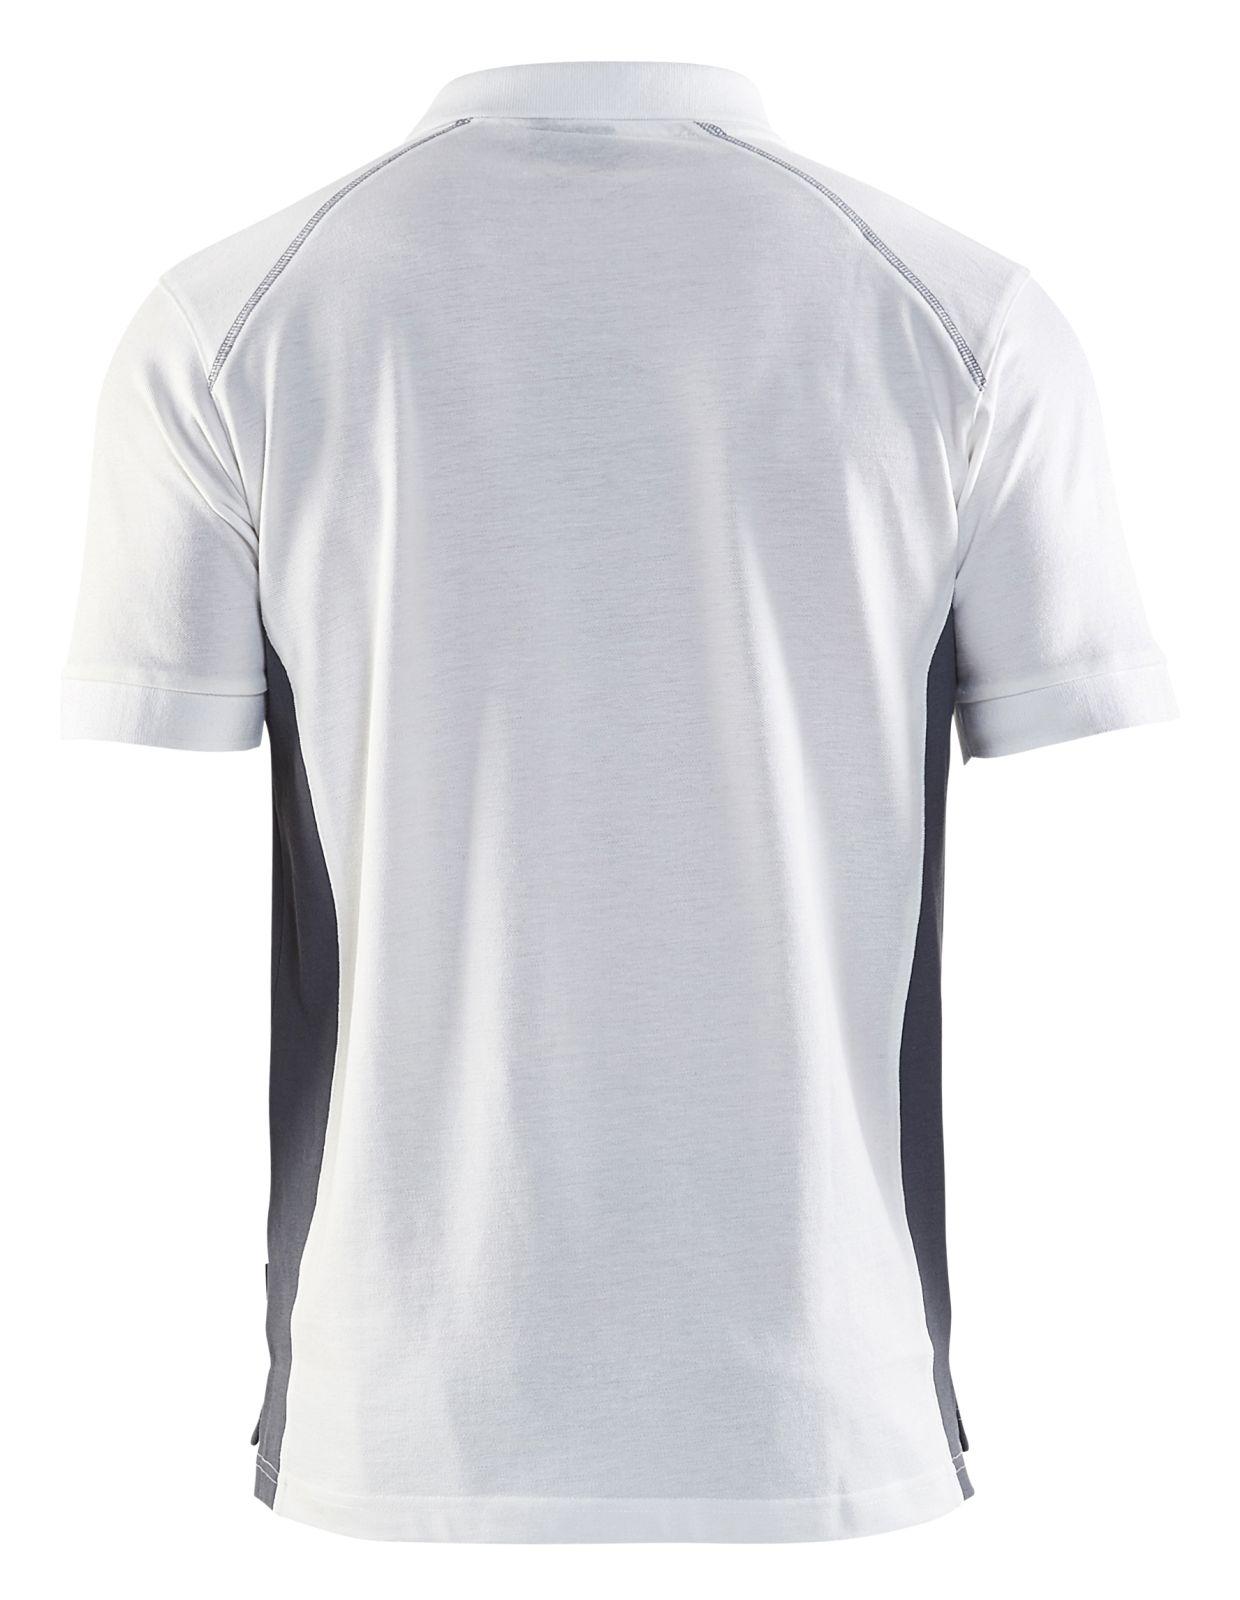 Blaklader Polo shirts 33241050 wit-grijs(1094)